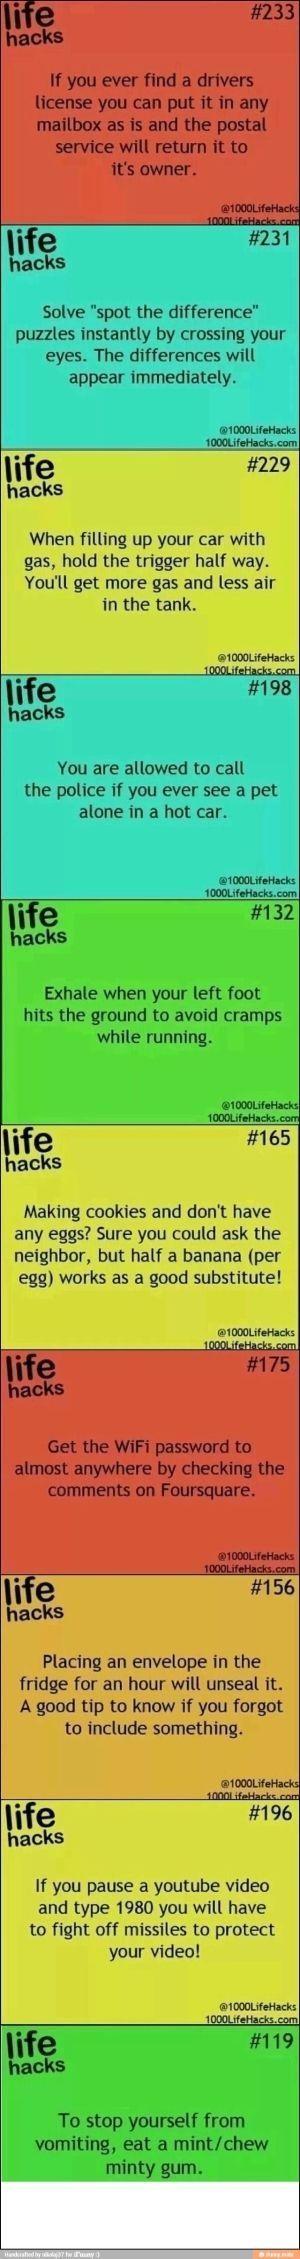 Endless Life Hacks: Life Hacks - Life hacks by LiveLoveLaughMyLife